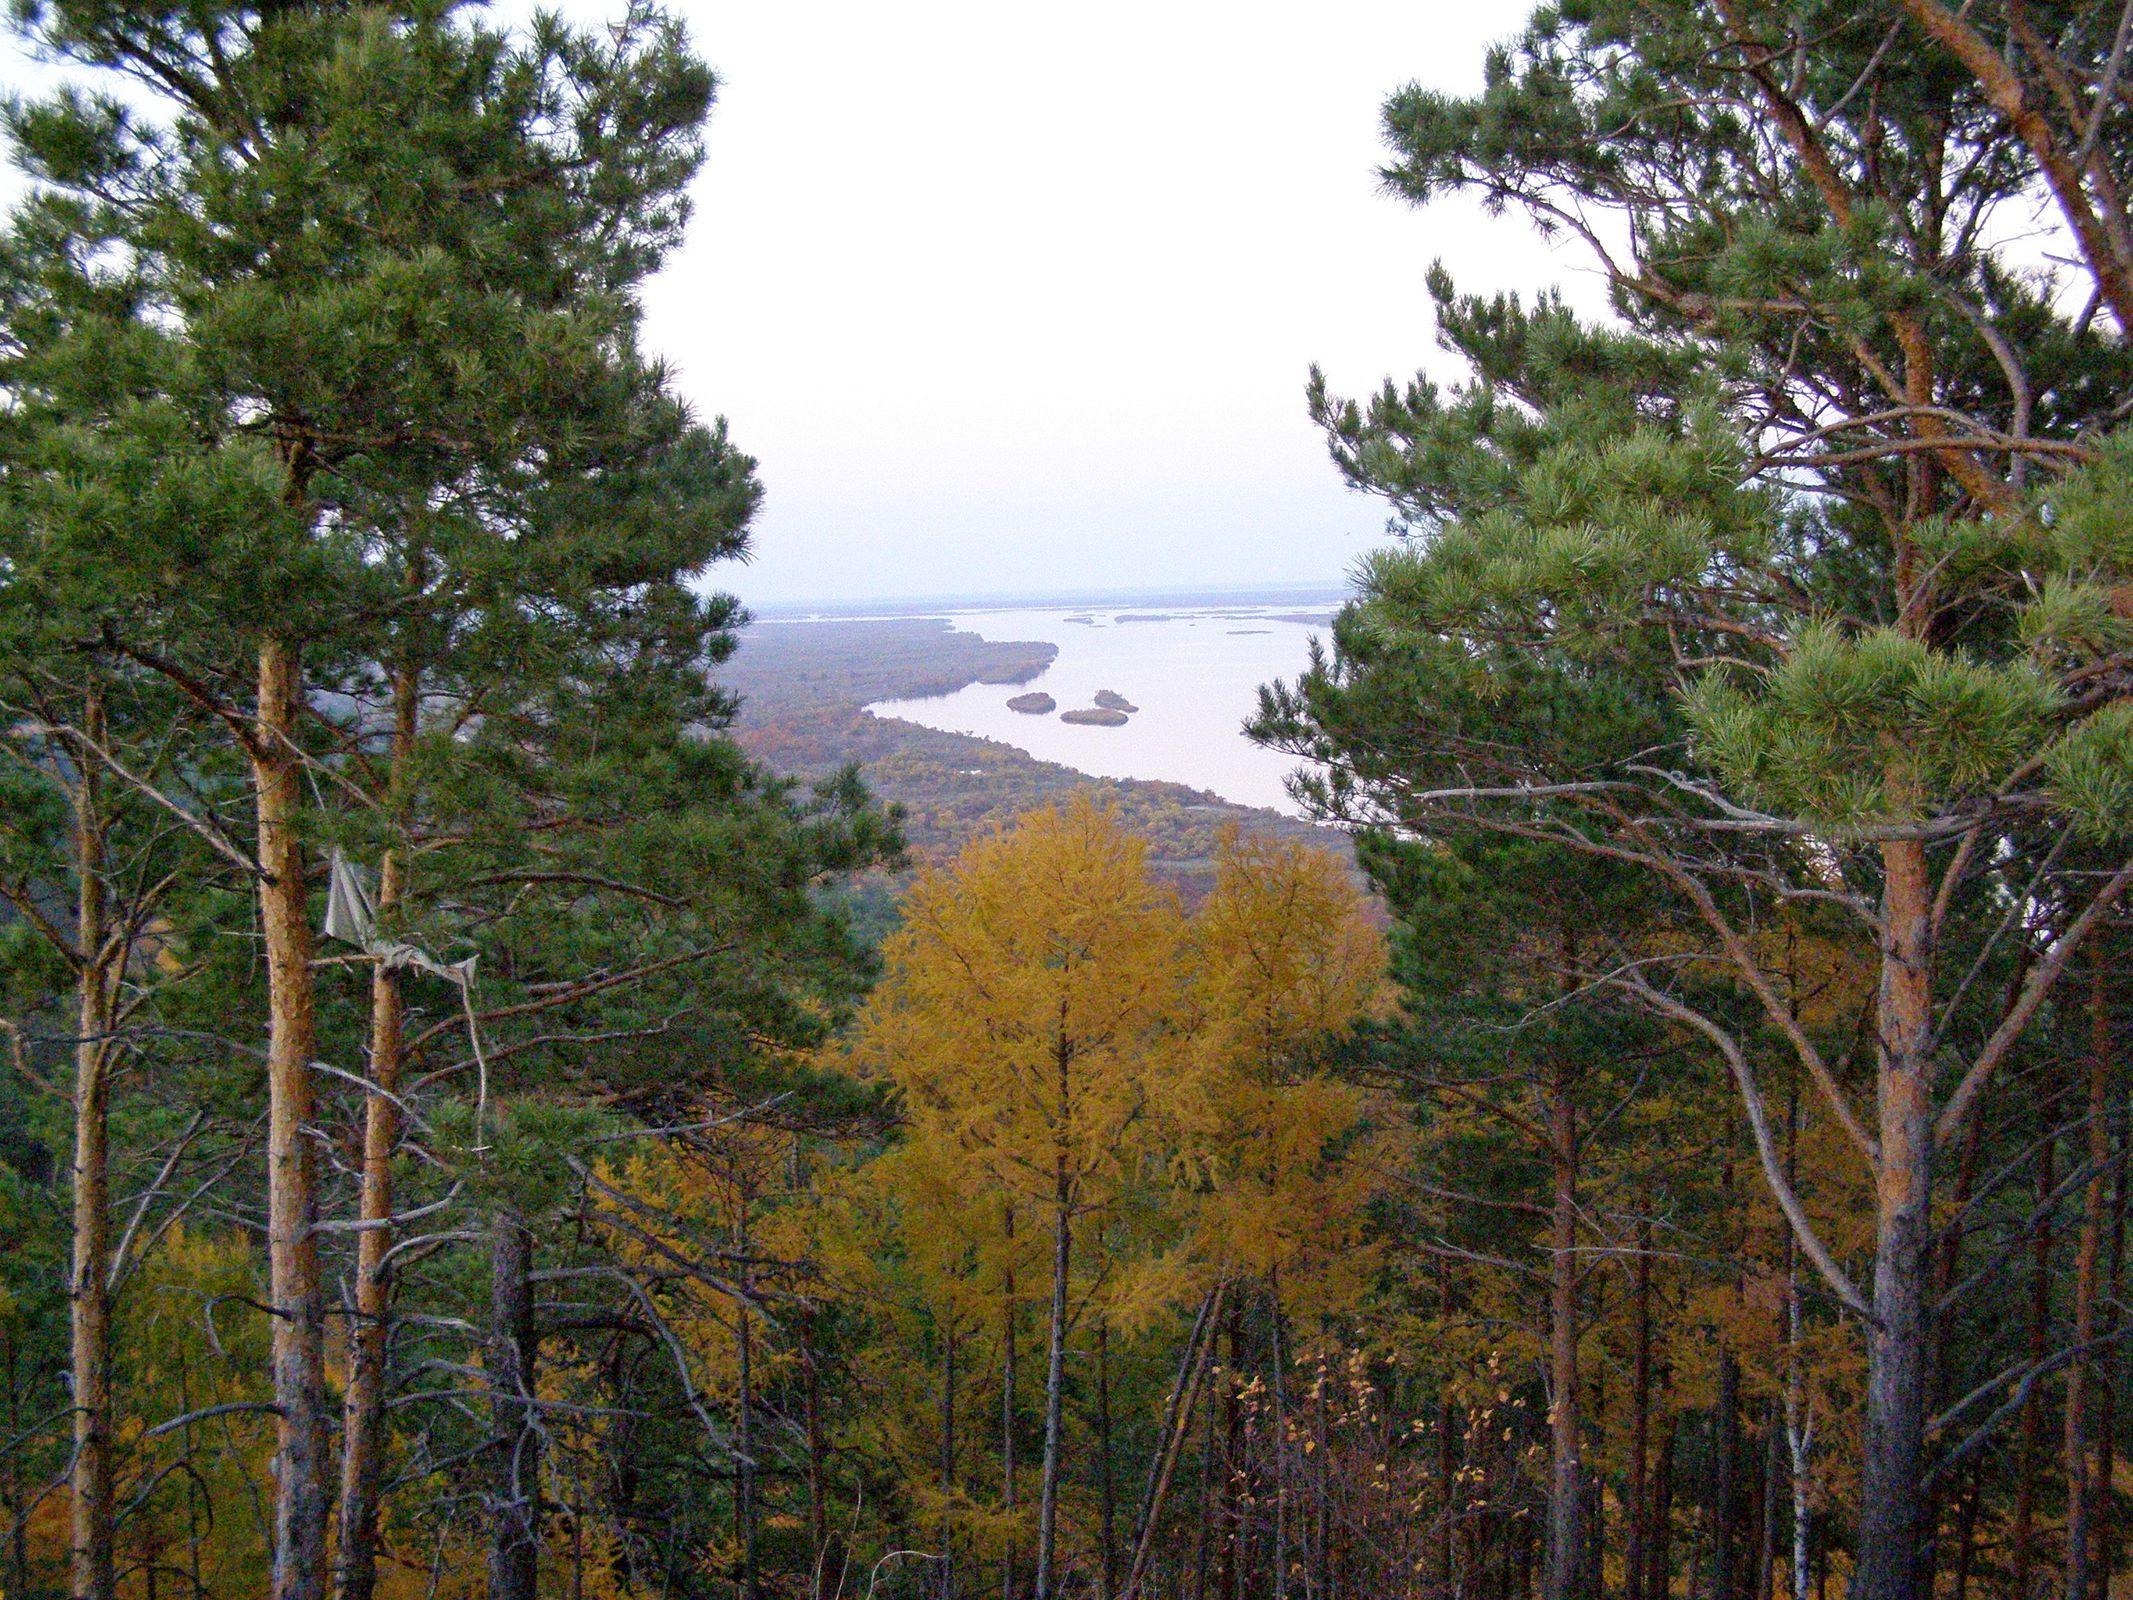 http://botsad-amur.ru/wp-content/uploads/2019/01/1900-Muhinka_3.jpg